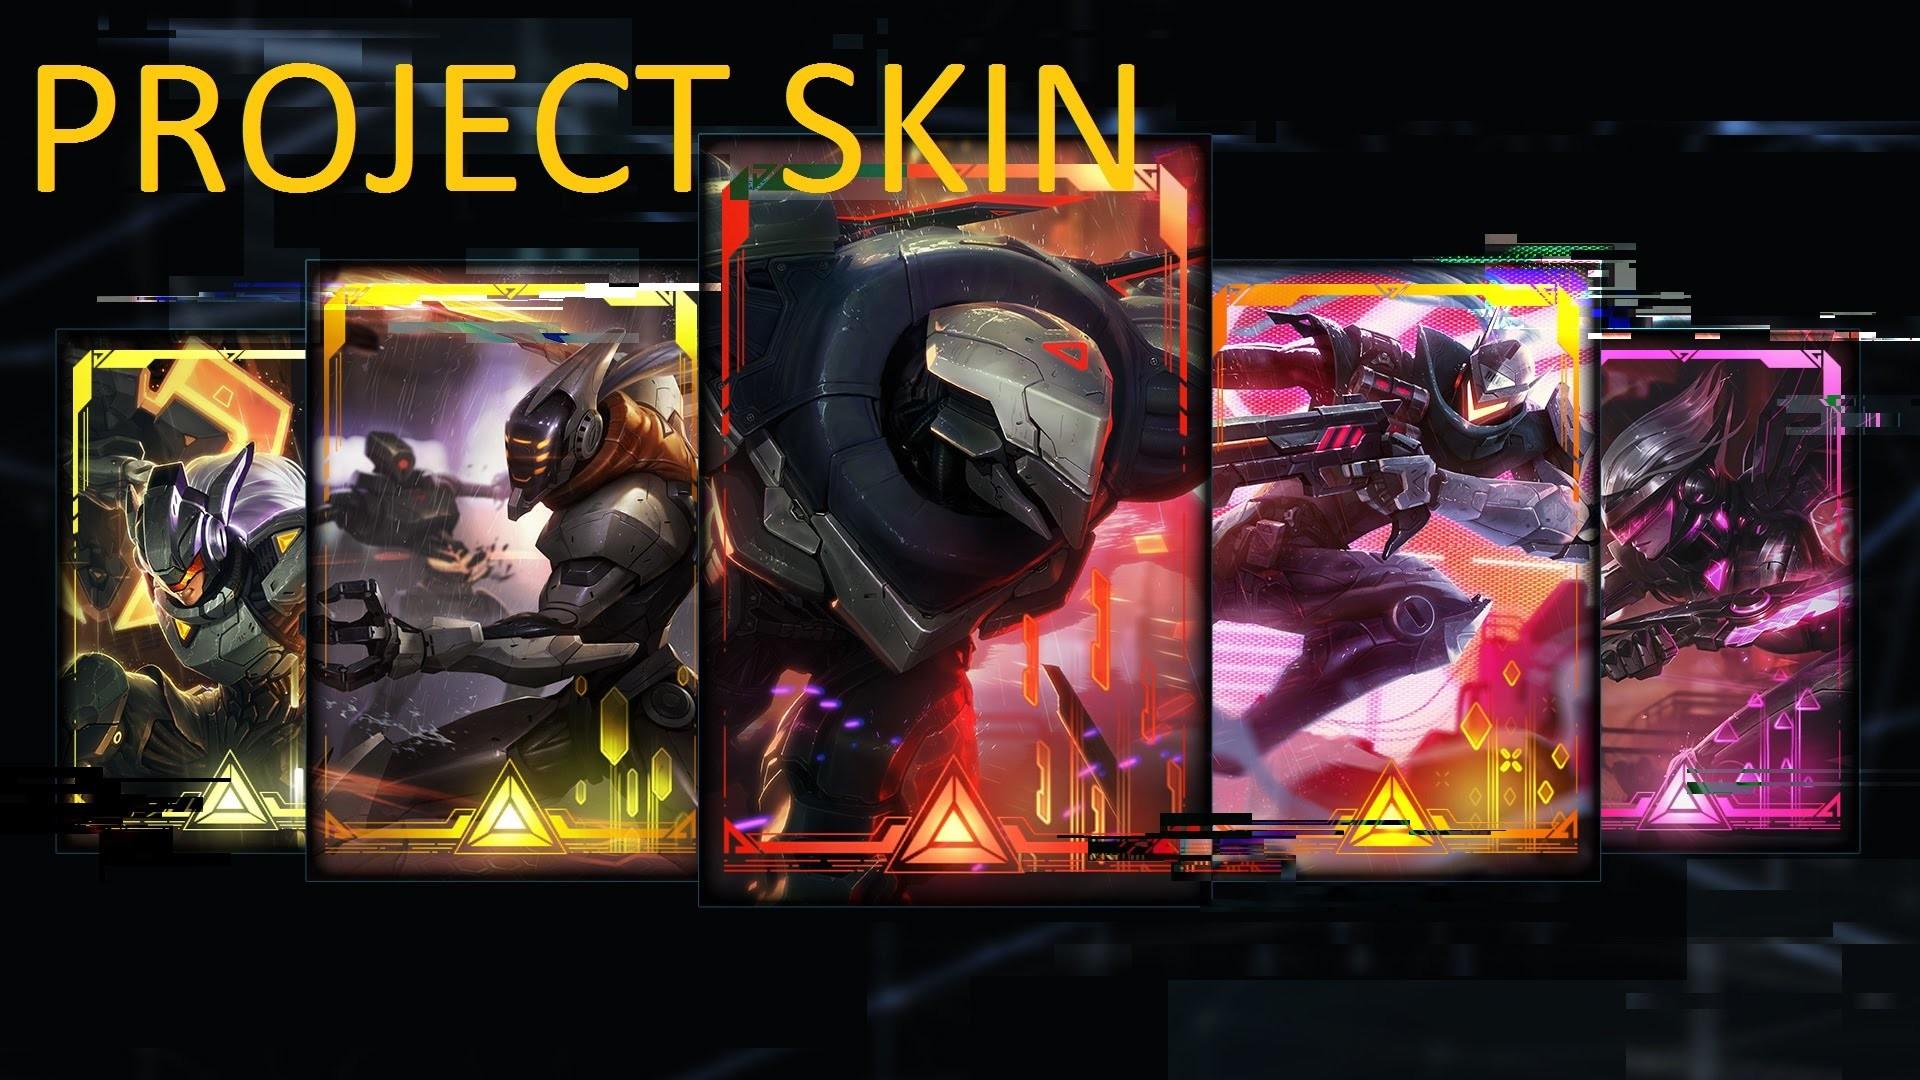 All Project Skins   Zed Yi Leona Fiora Lucian Yasuo   League of Legend Skin  – YouTube